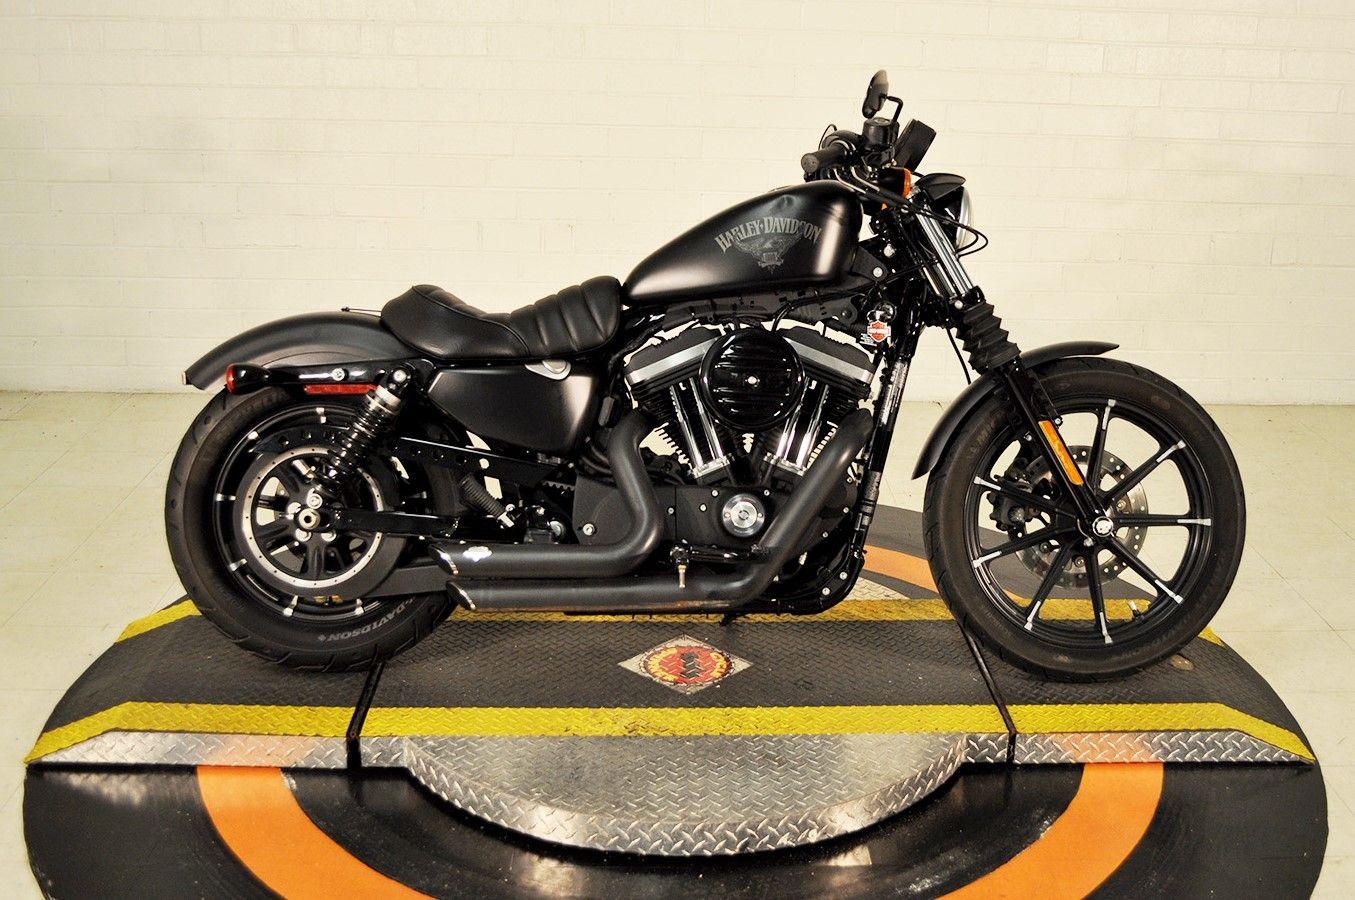 Pre Owned 2016 Harley Davidson Iron 883 In Winston Salem Pn416364 Smokin Harley Davidson